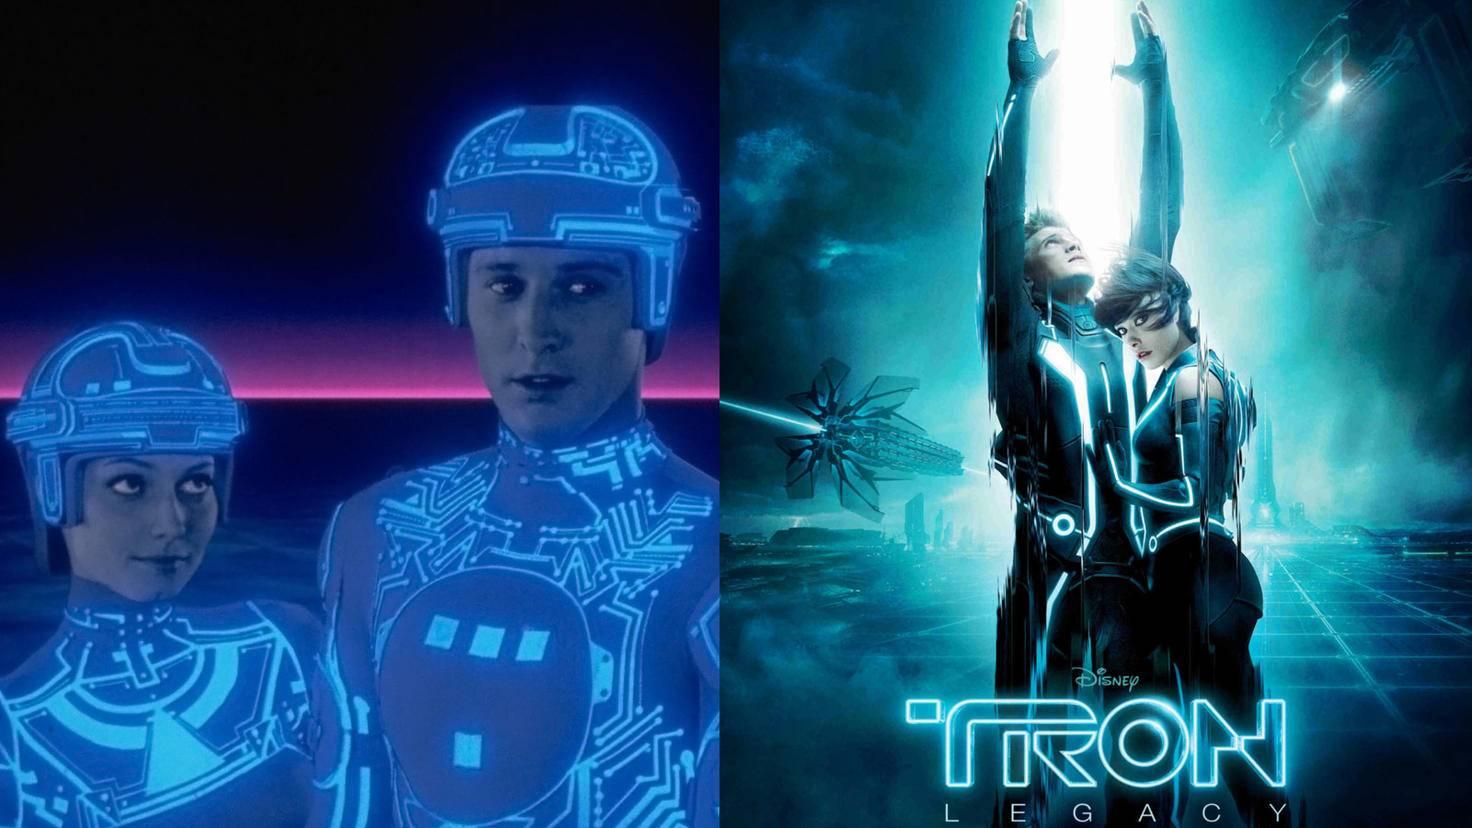 Tron-Walt Disney Studios-Tron Legacy-Filmposter-picture alliance-Everett Collection-92613032